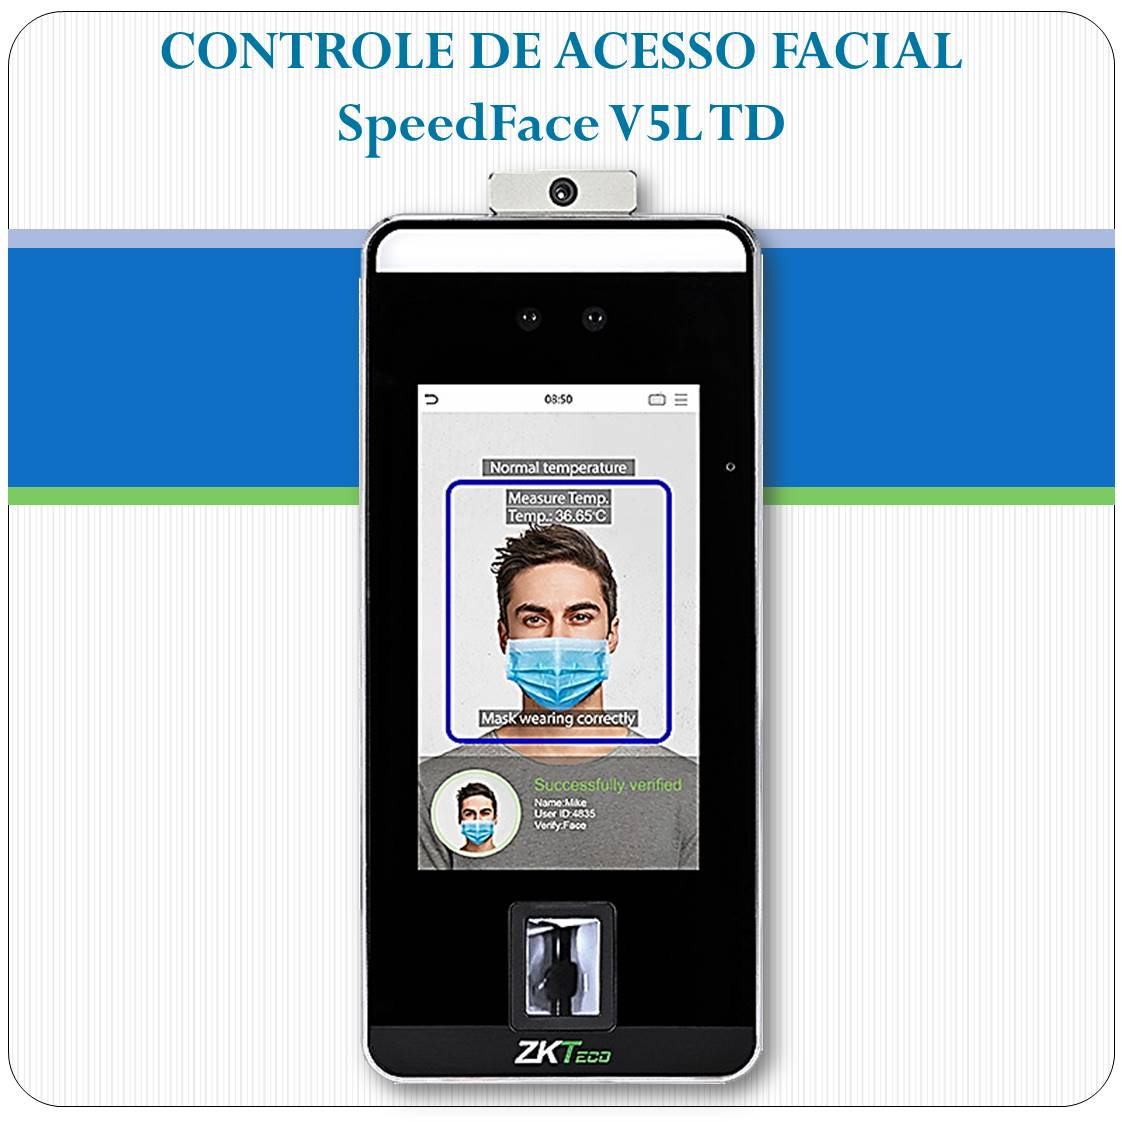 Controle de Acesso Facial - SpeedFace V5L TD